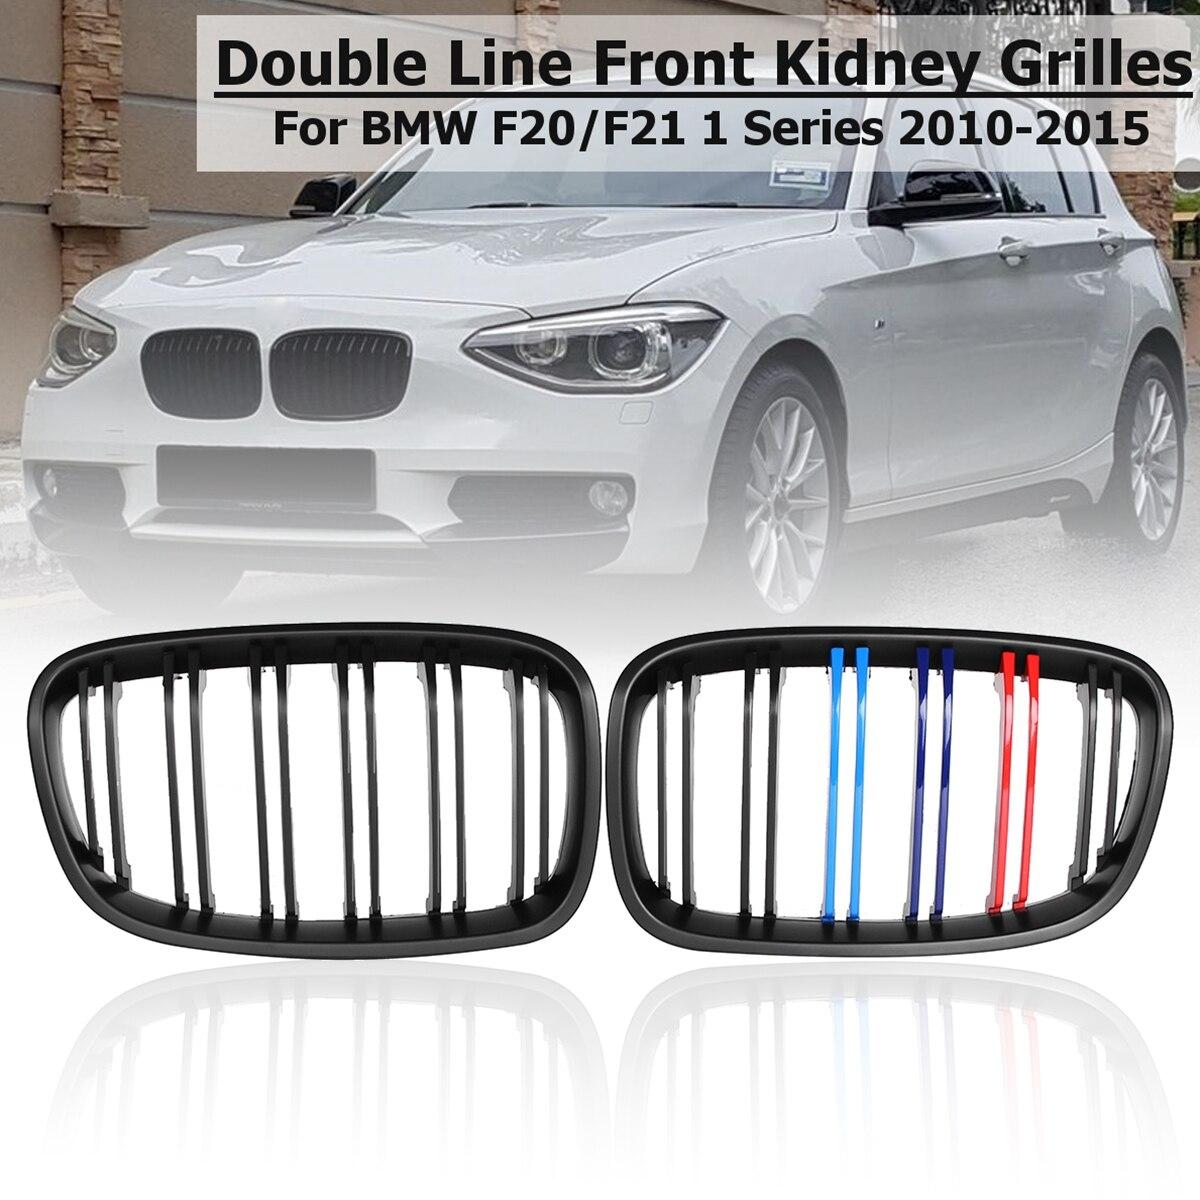 For 2011-2014 BMW F20 F21 1 Series Hatchback Sport Kidney Grill Grille Dual Slat